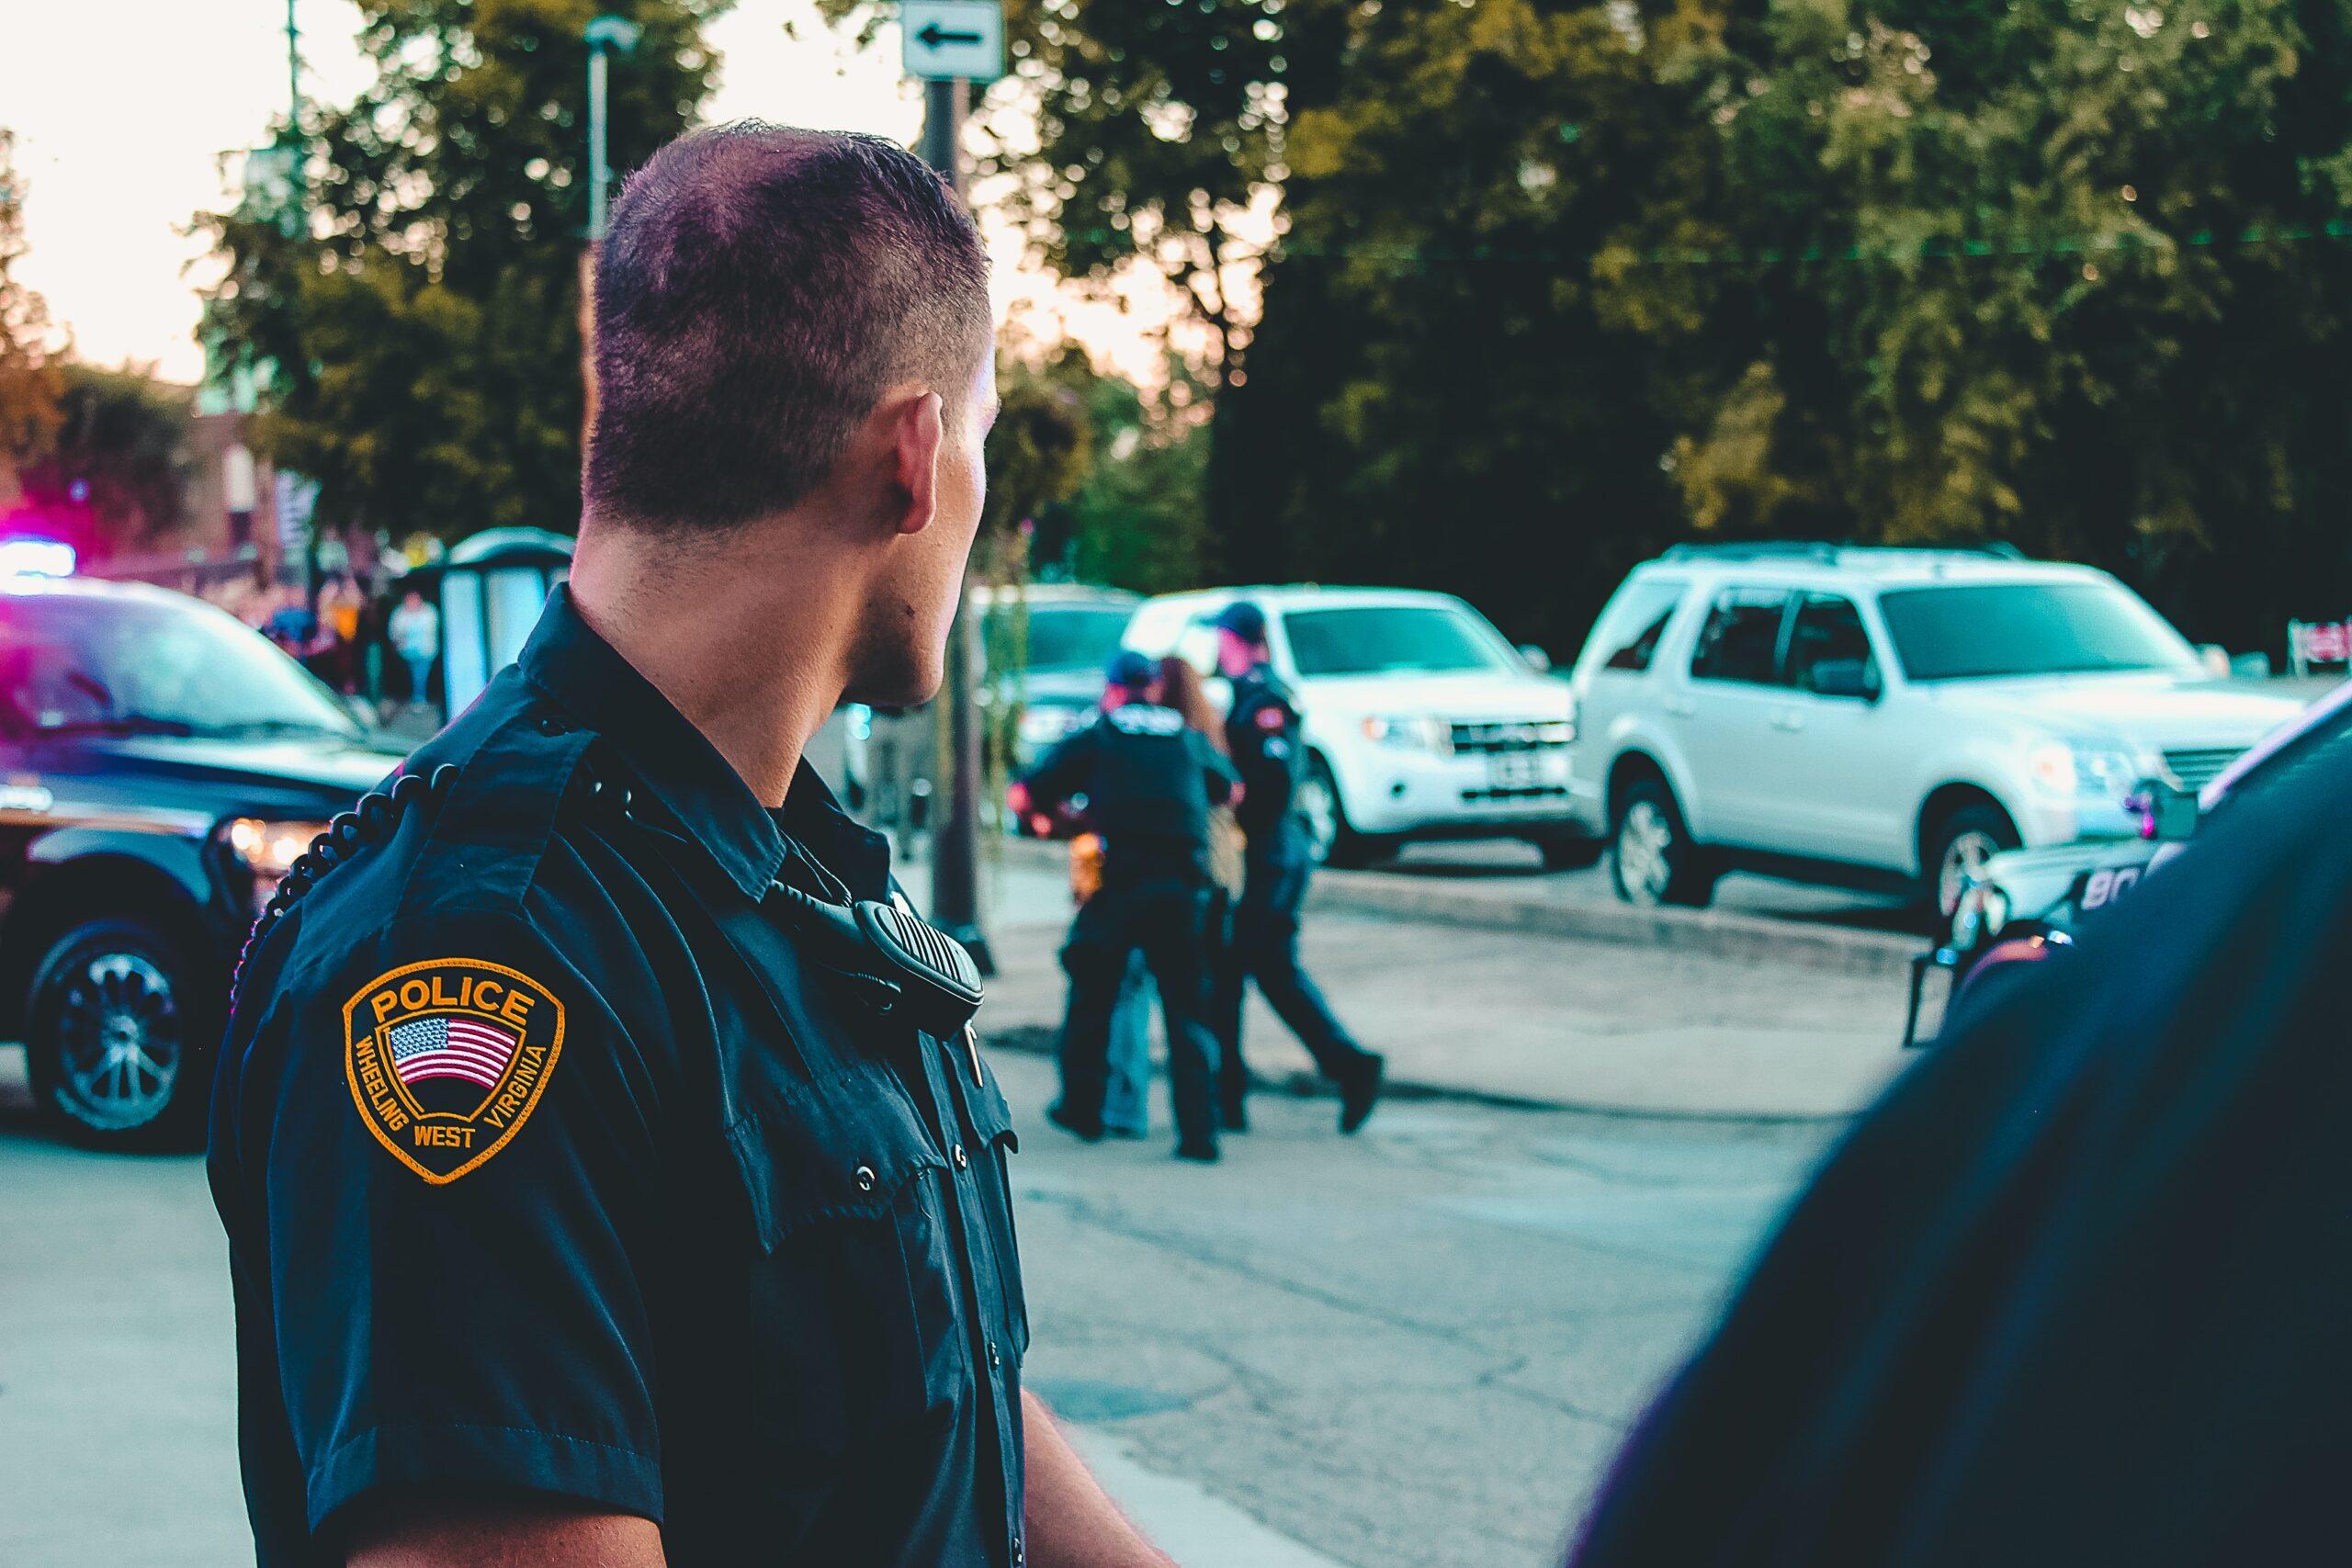 man-wearing-black-officer-uniform-1464230